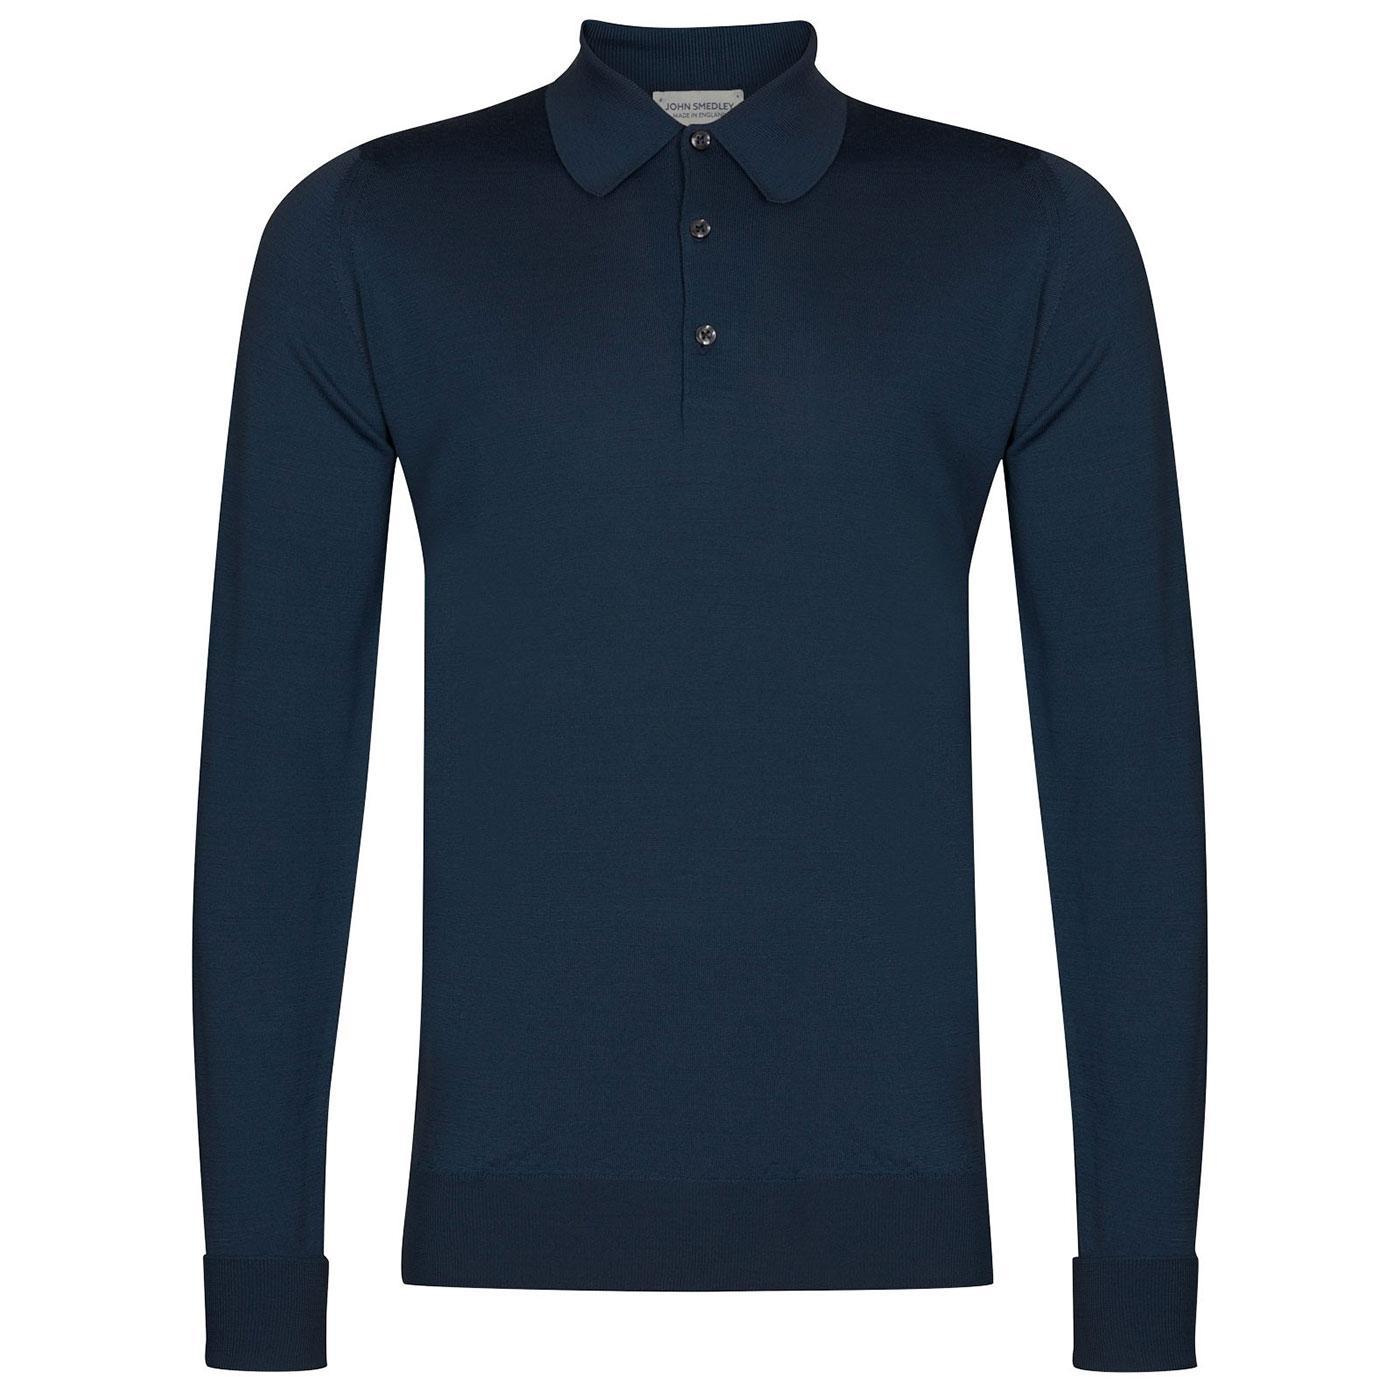 Dorset JOHN SMEDLEY 60s Knitted Mod Polo Shirt VB